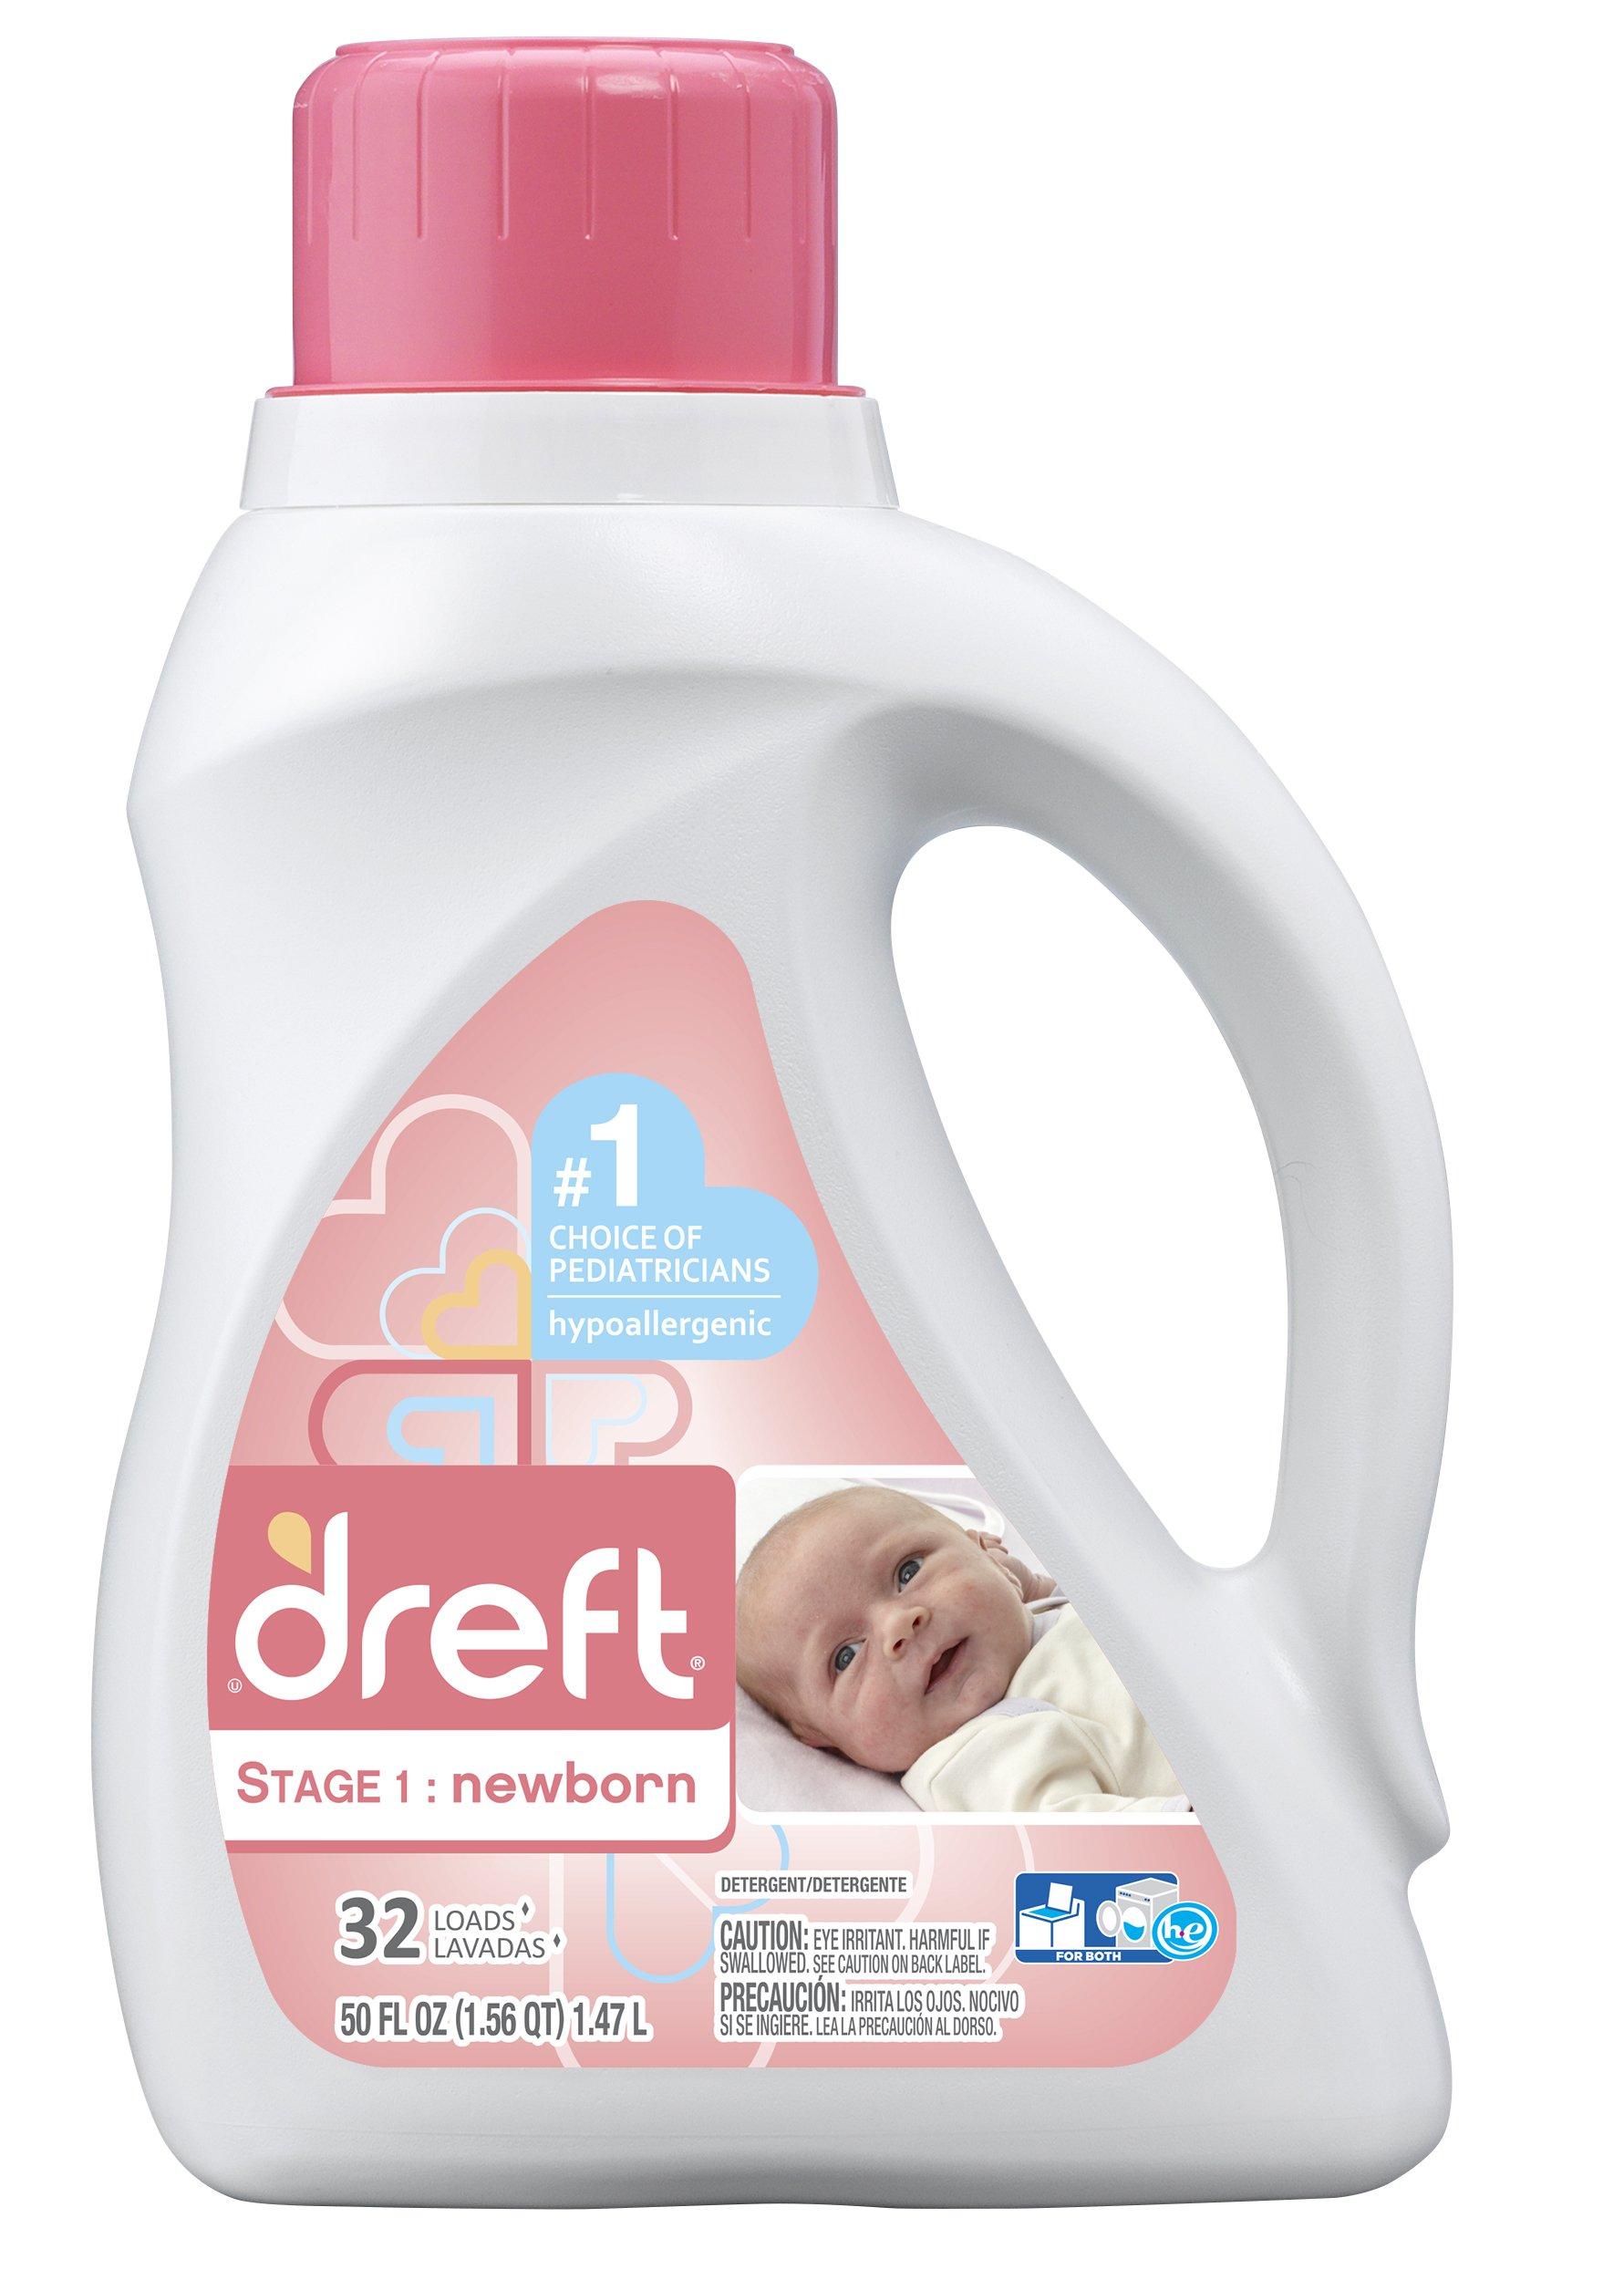 Dreft Stage 1: Newborn Liquid Laundry Detergent (HE),Natural for Baby, Newborn, or Infant, 50 oz, 32 loads by Dreft